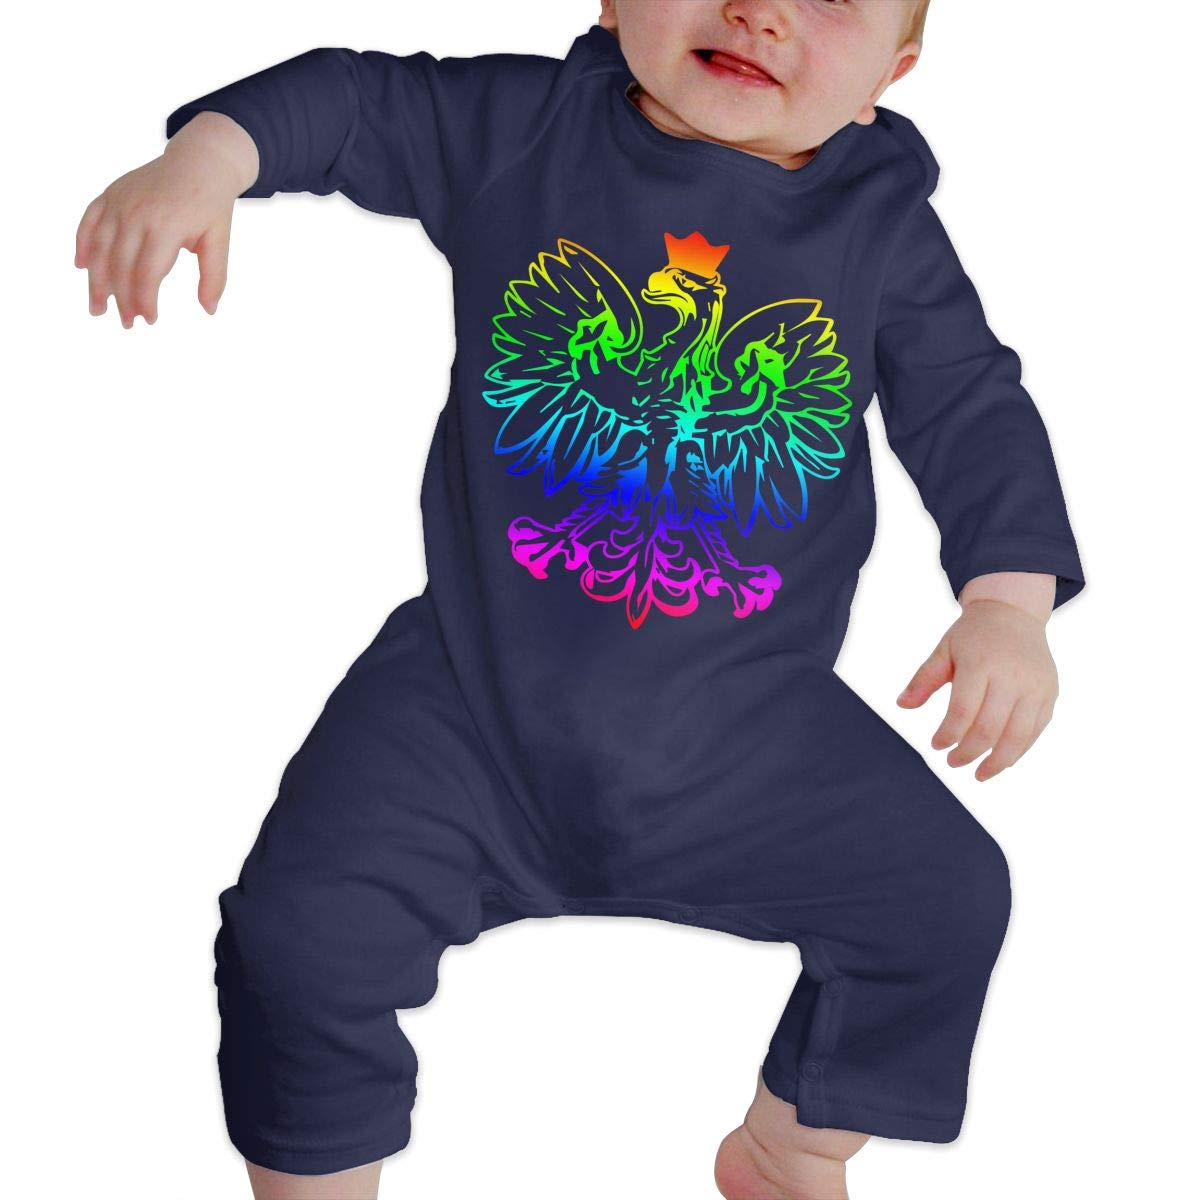 Mri-le1 Baby Girl Bodysuits Poland Pride-2 Infant Long Sleeve Romper Jumpsuit